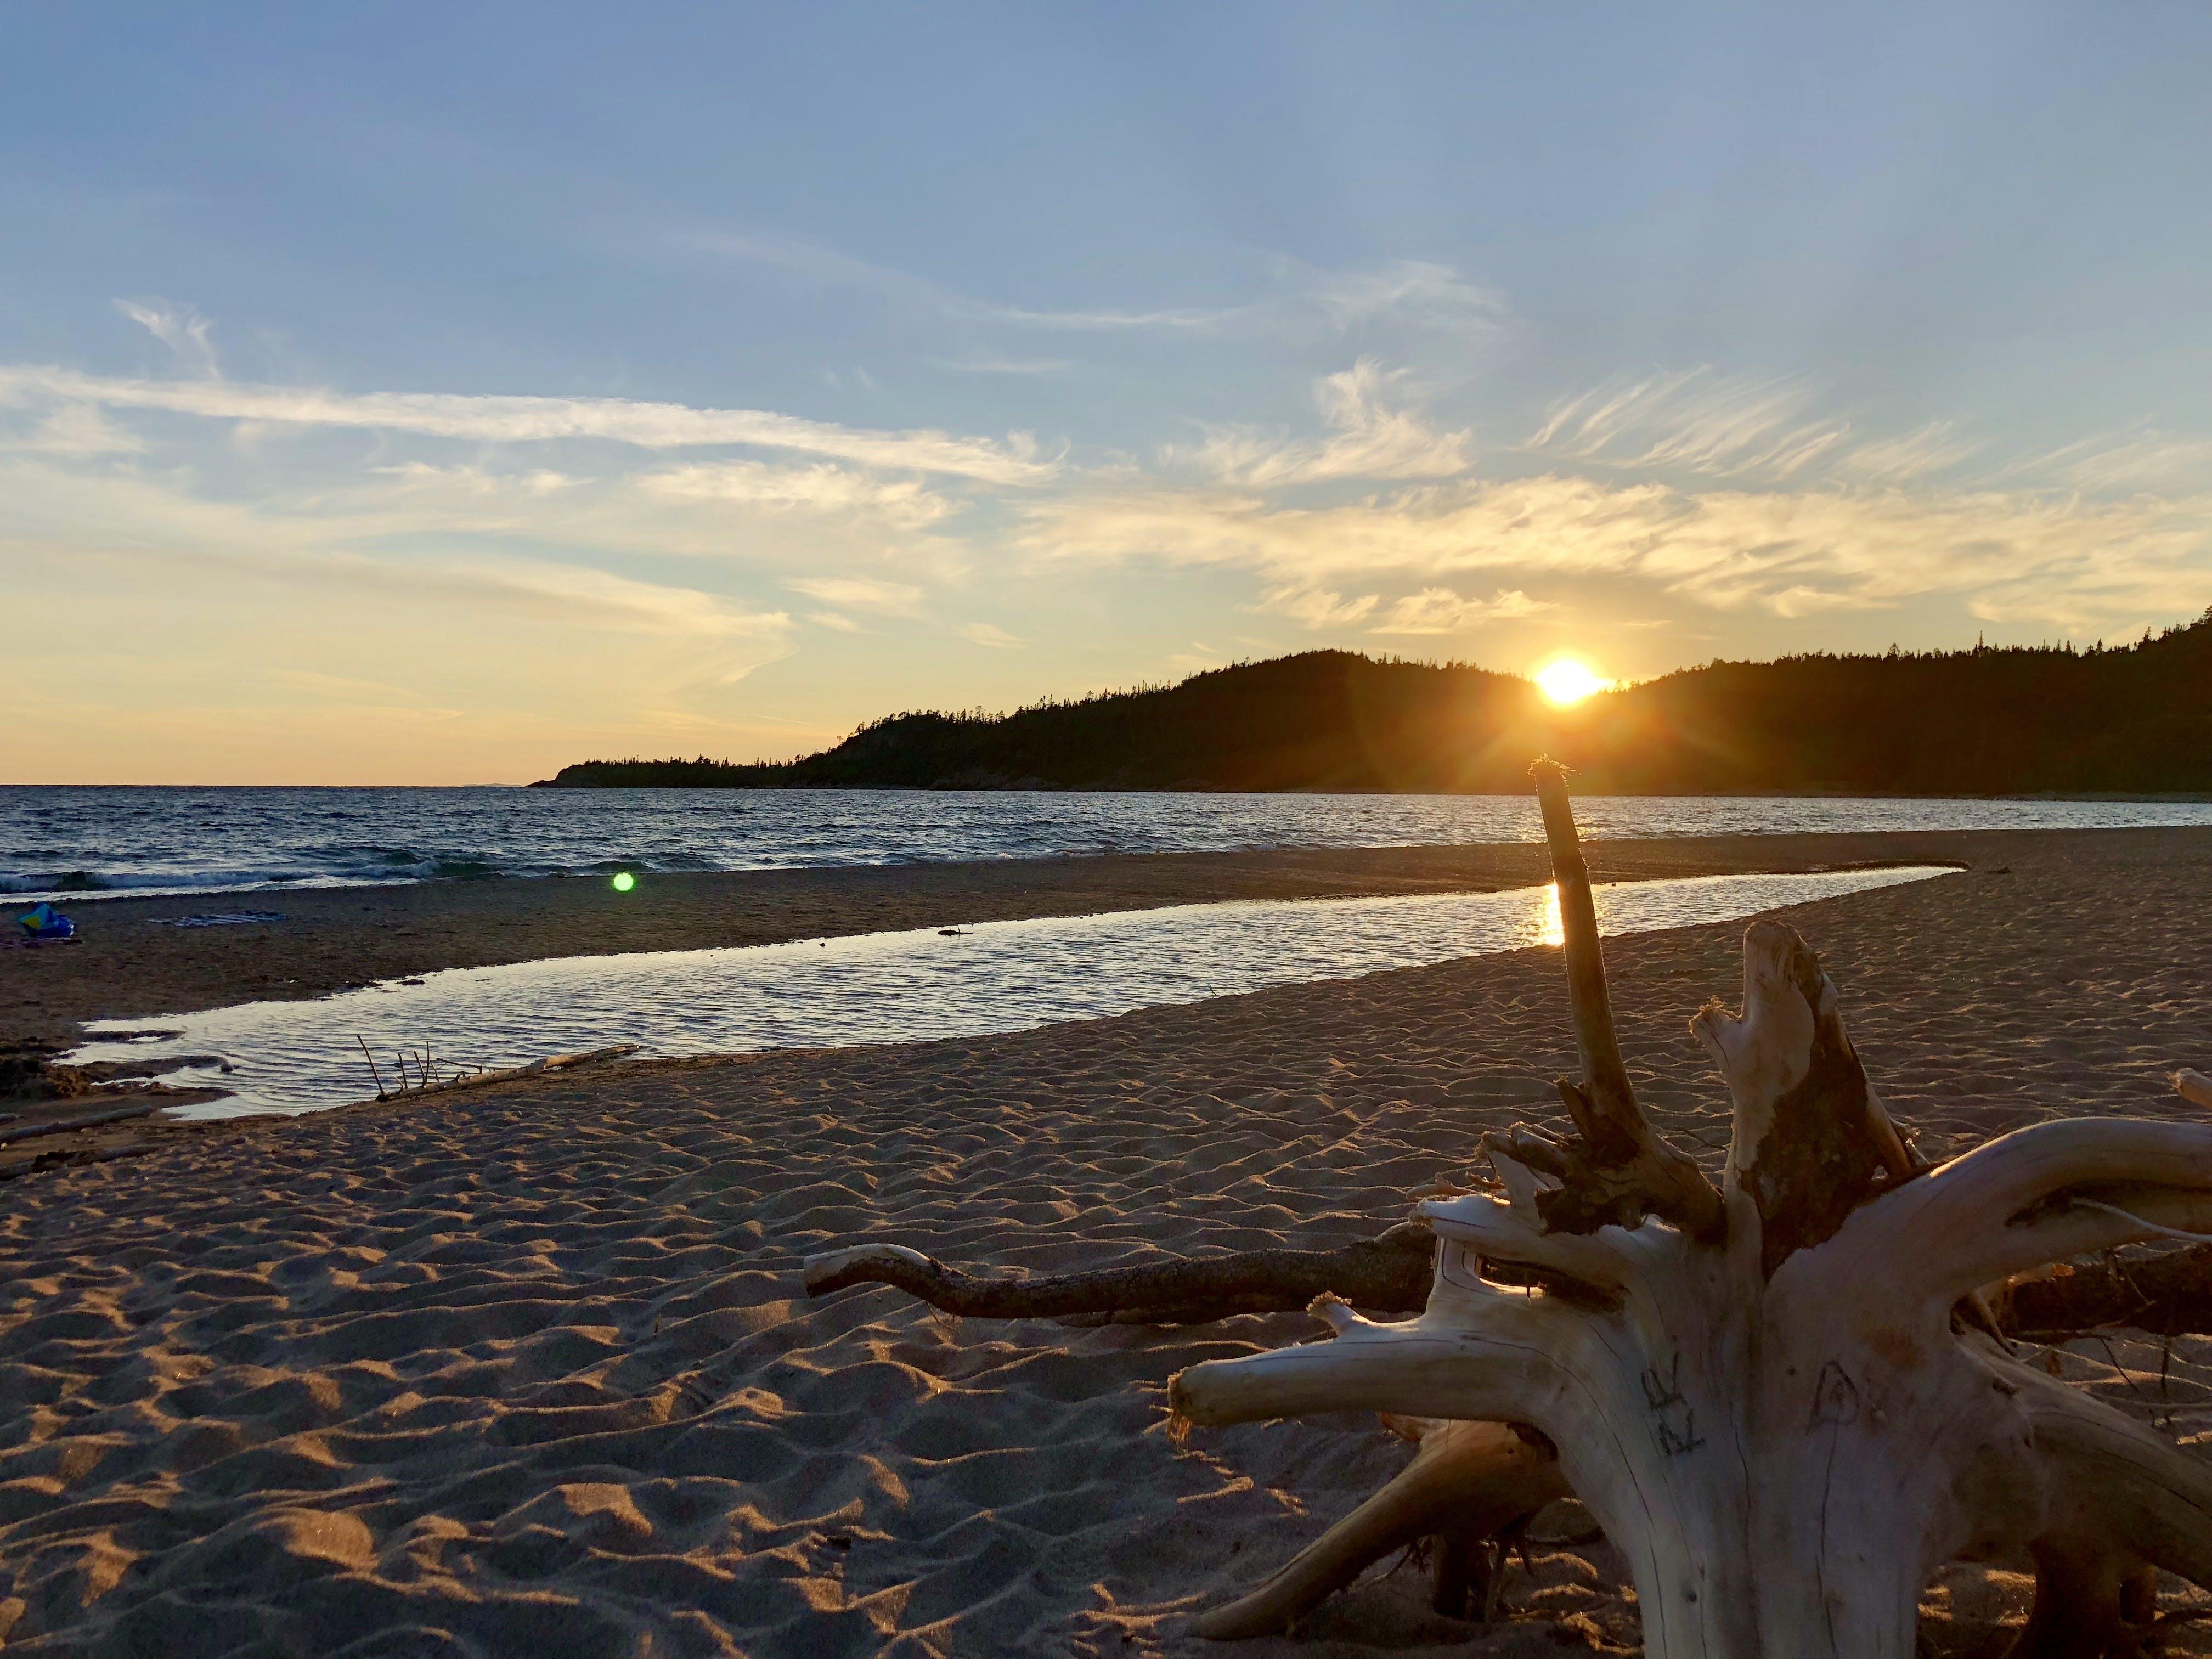 Driftwood on beach at sunset